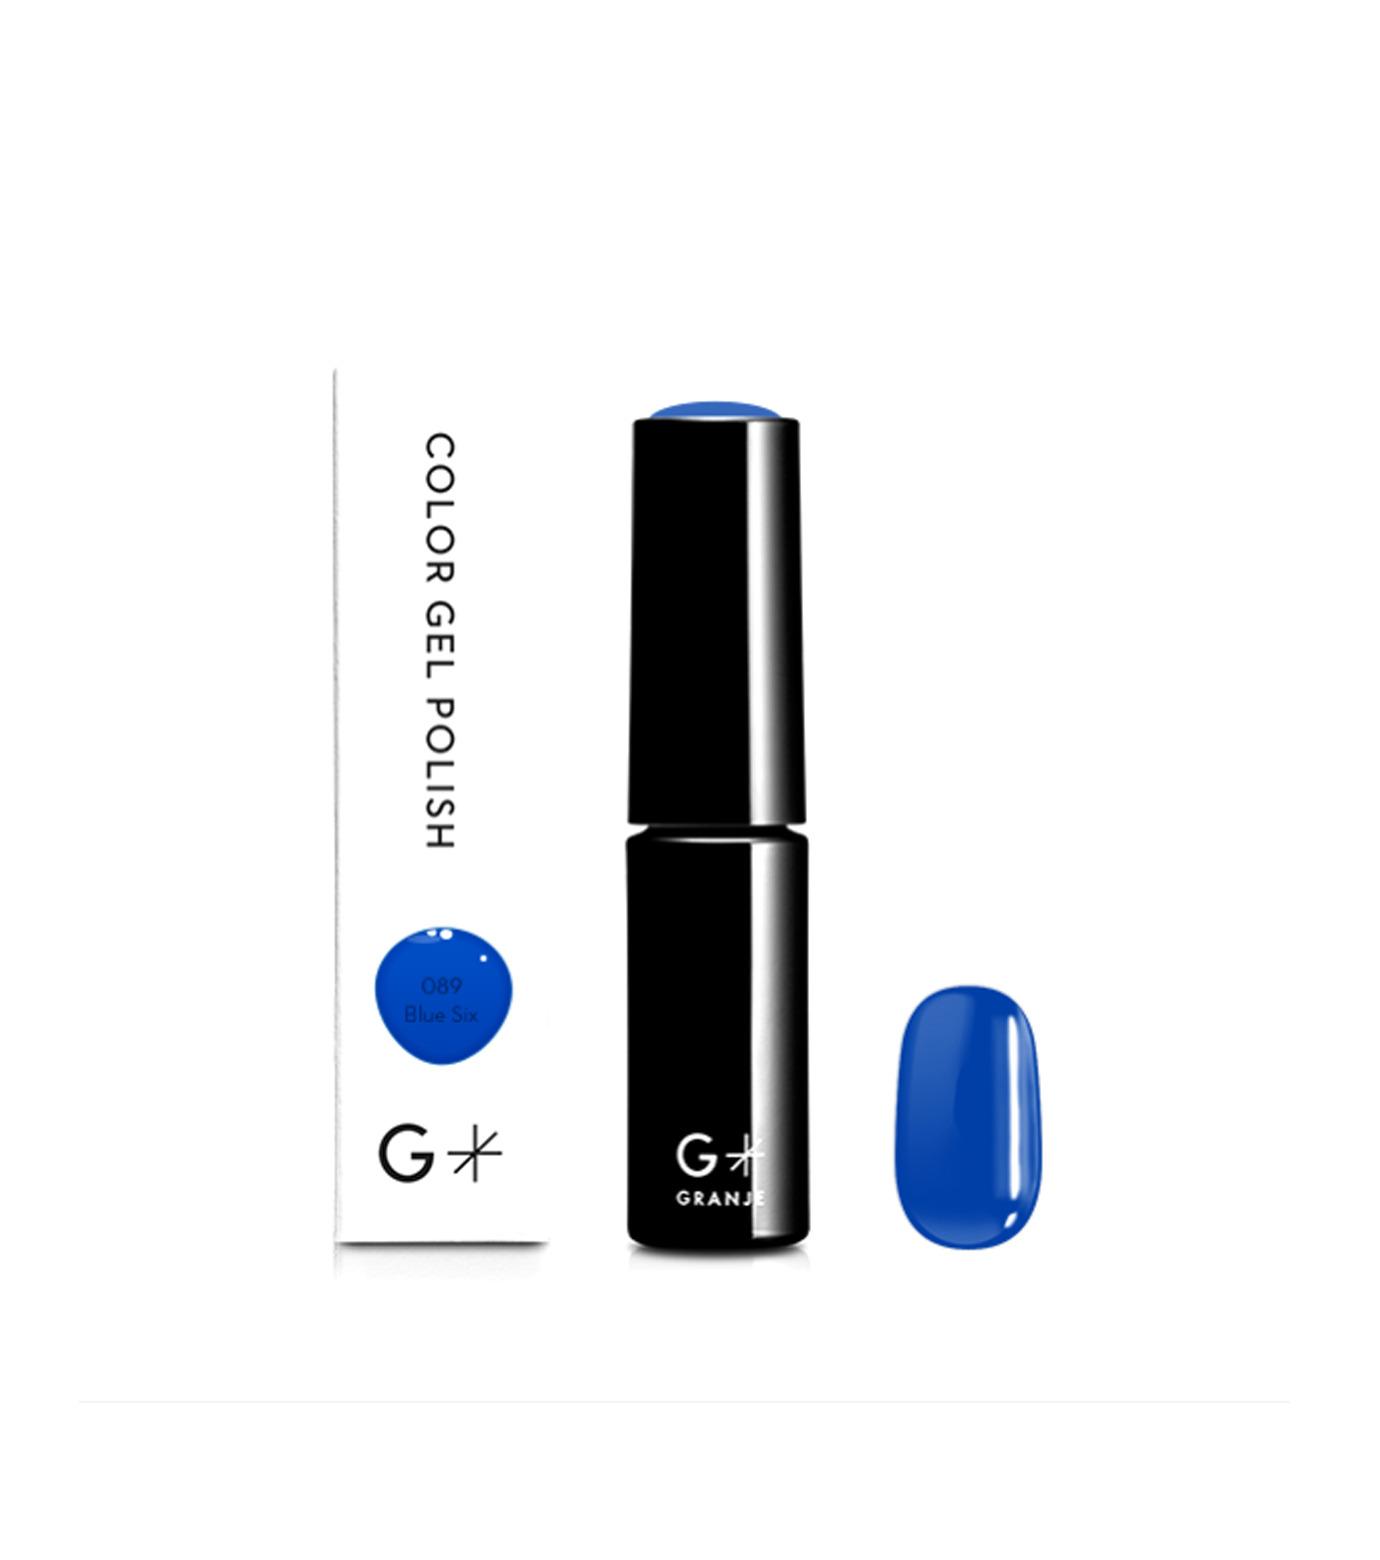 GRANJE(グランジェ)のBlue Six-BLUE(MAKE-UP/MAKE-UP)-O89-92 拡大詳細画像1